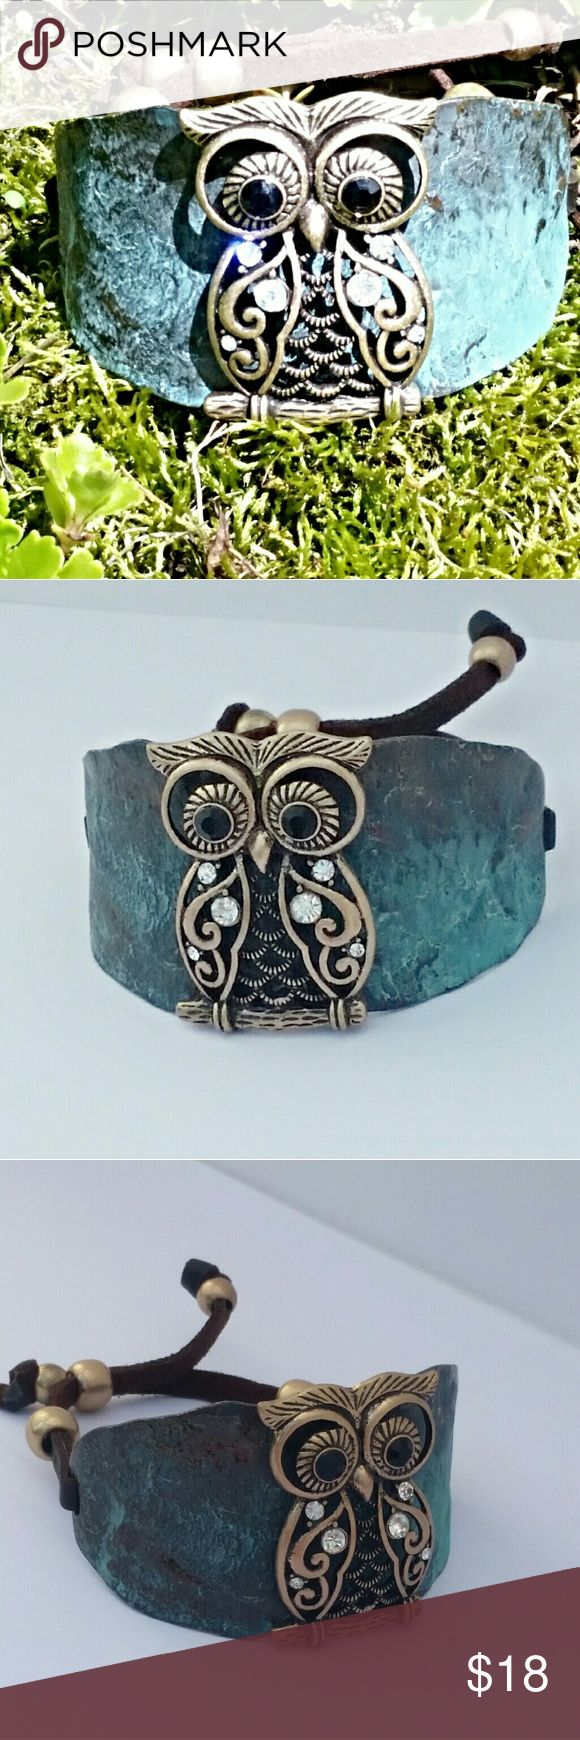 Owl Bracelet Very unique owl bracelet. Adjustable length. Slips over wrist with adjustable laces. Very comfortable Lady Adorned Boutique Jewelry Bracelets